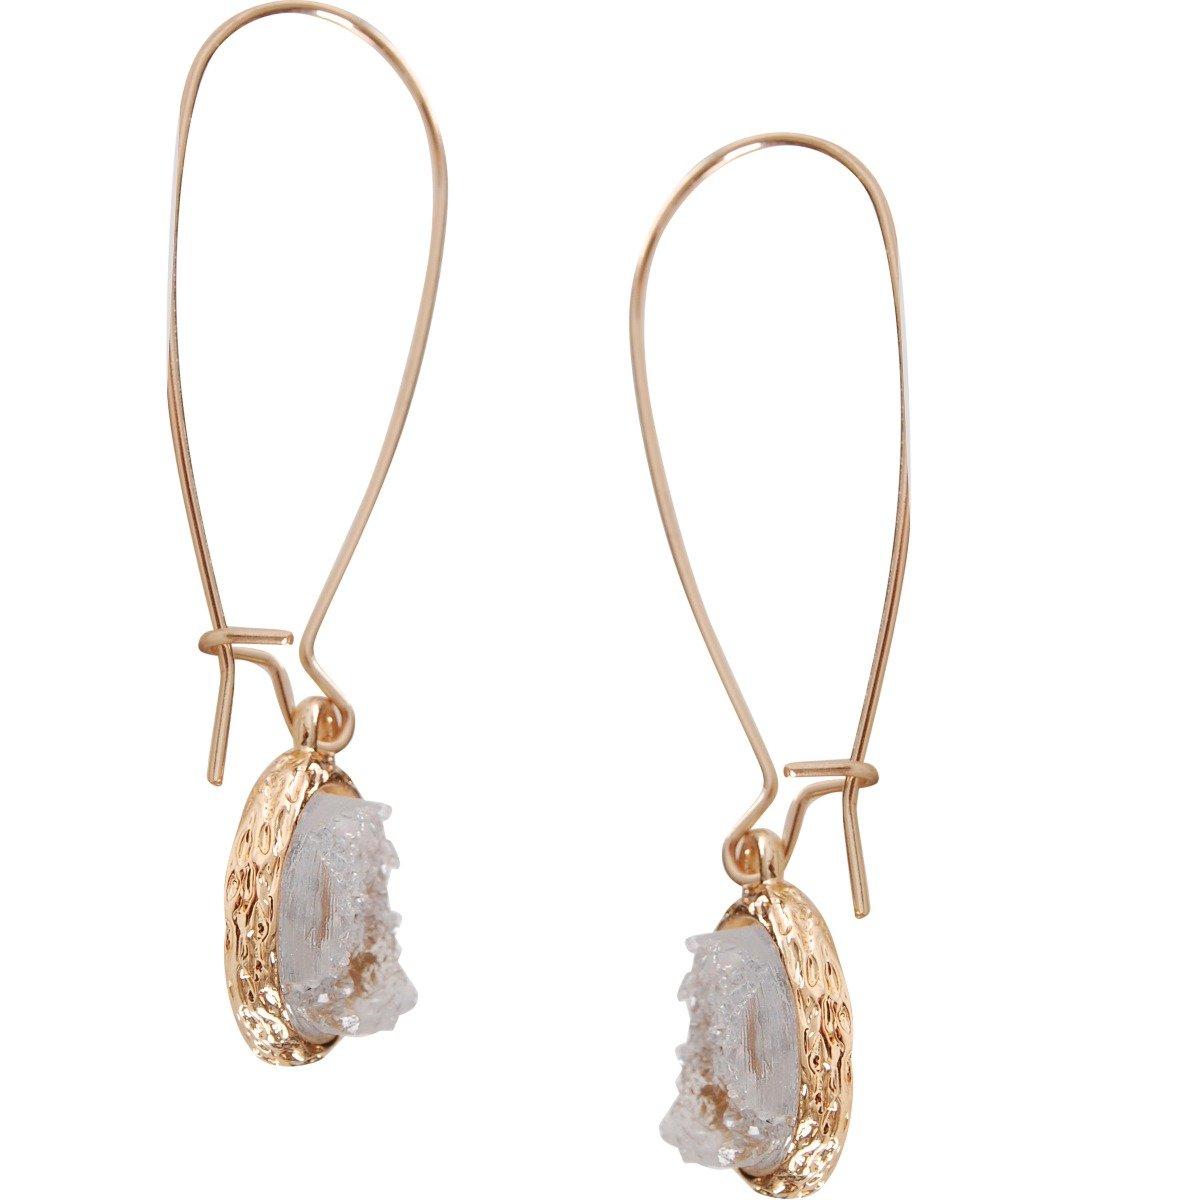 Humble Chic Simulated Druzy Threaders Upside-Down Long Hoop Dangle Drop Earrings for Women